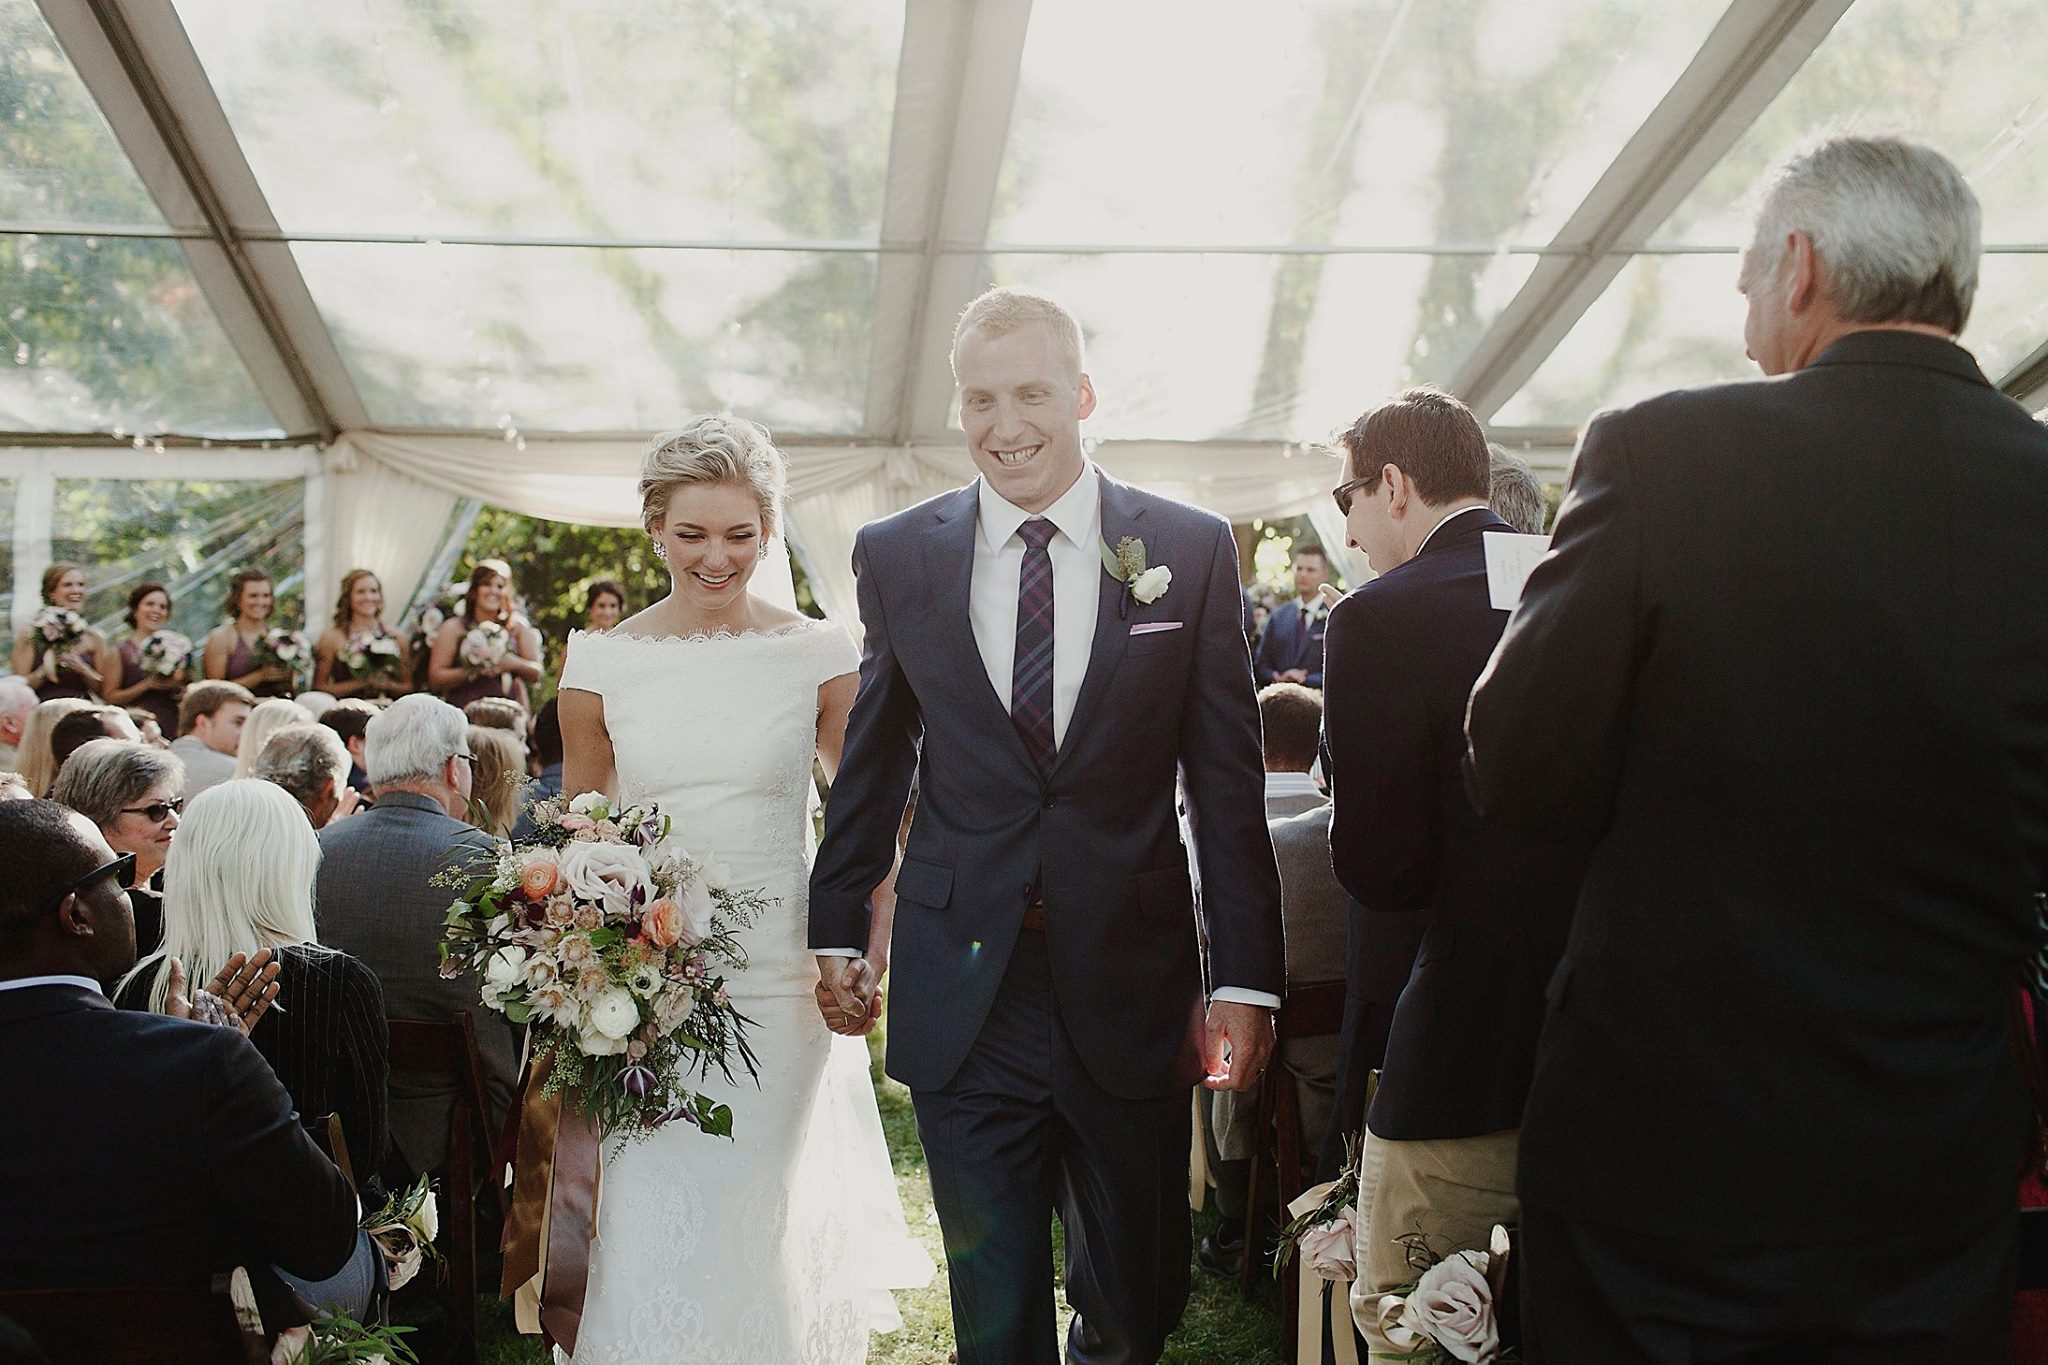 Grand Rapids, Michigan Bride and Groom Ceremony Photos